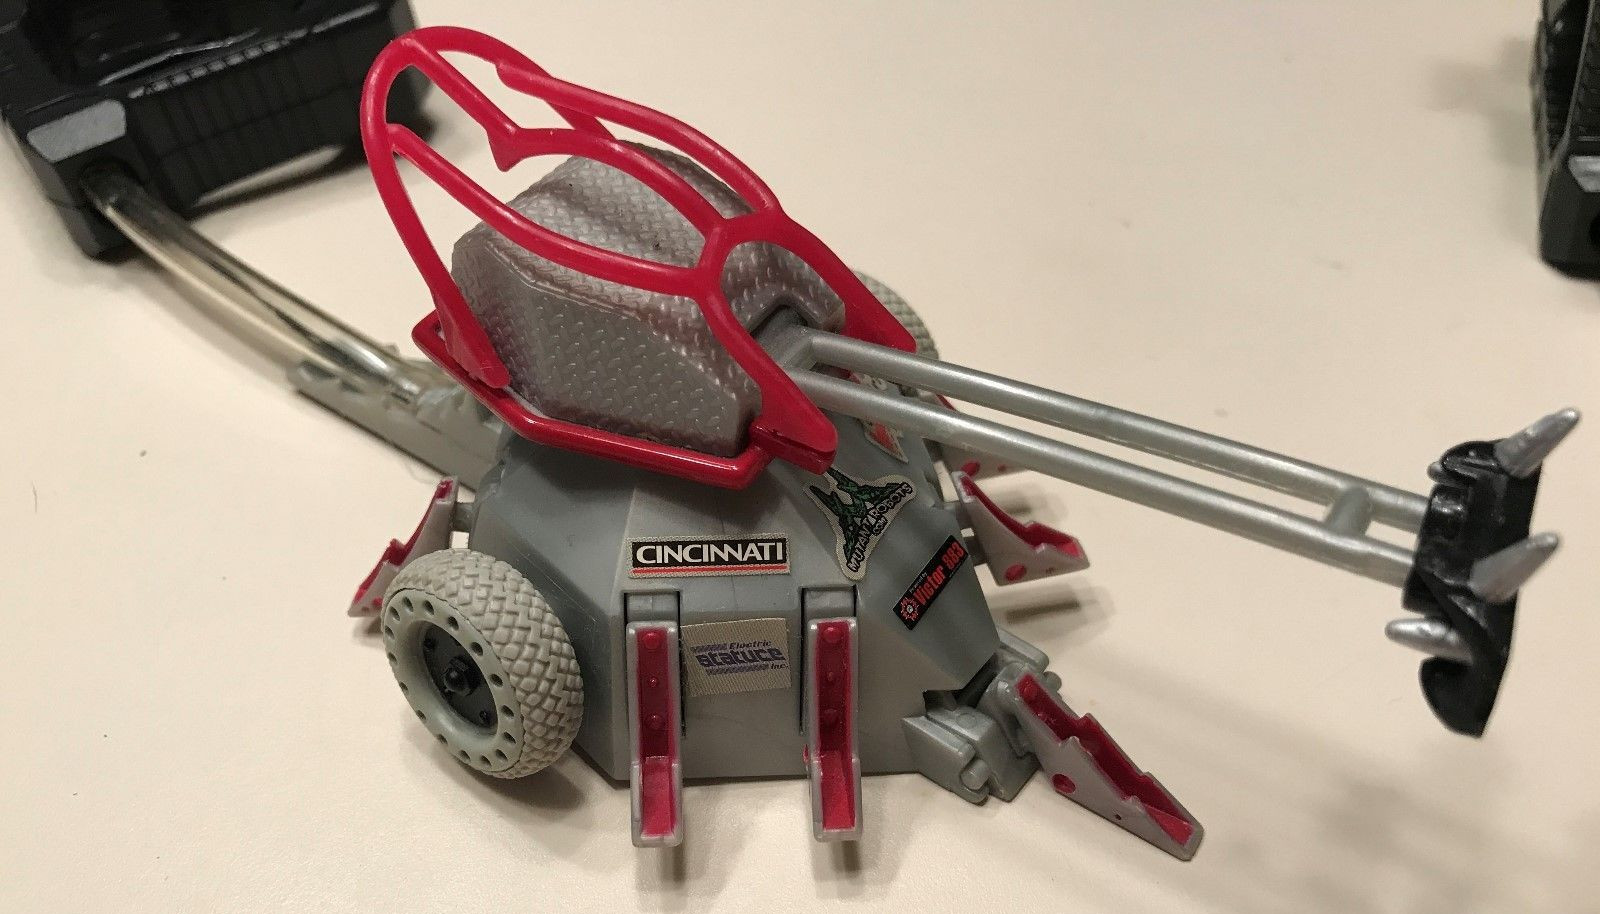 Tazbot/Grip N' Grappler